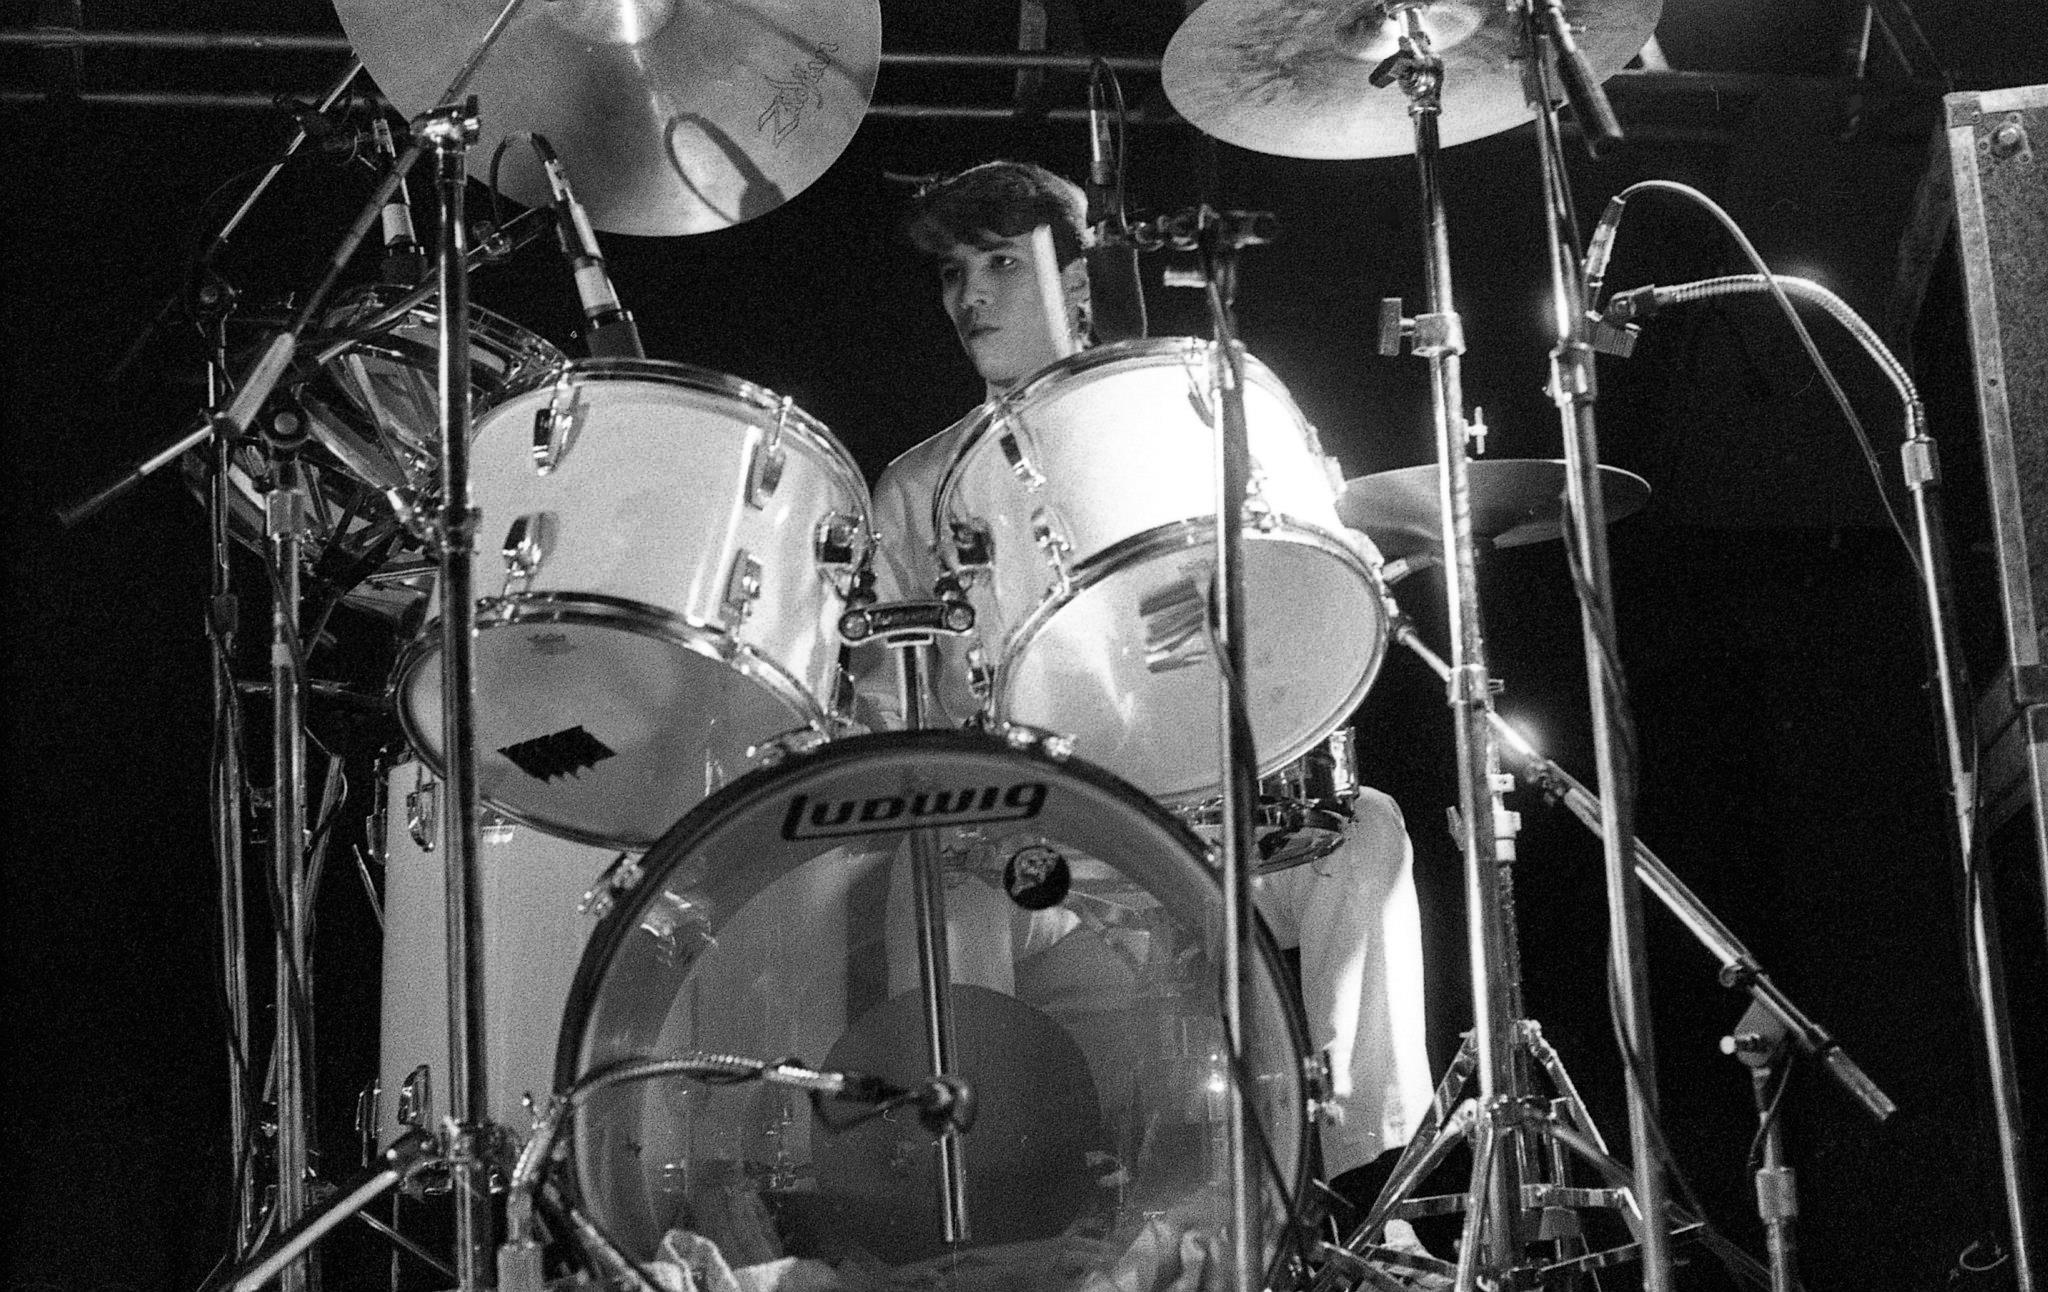 derrick  drums